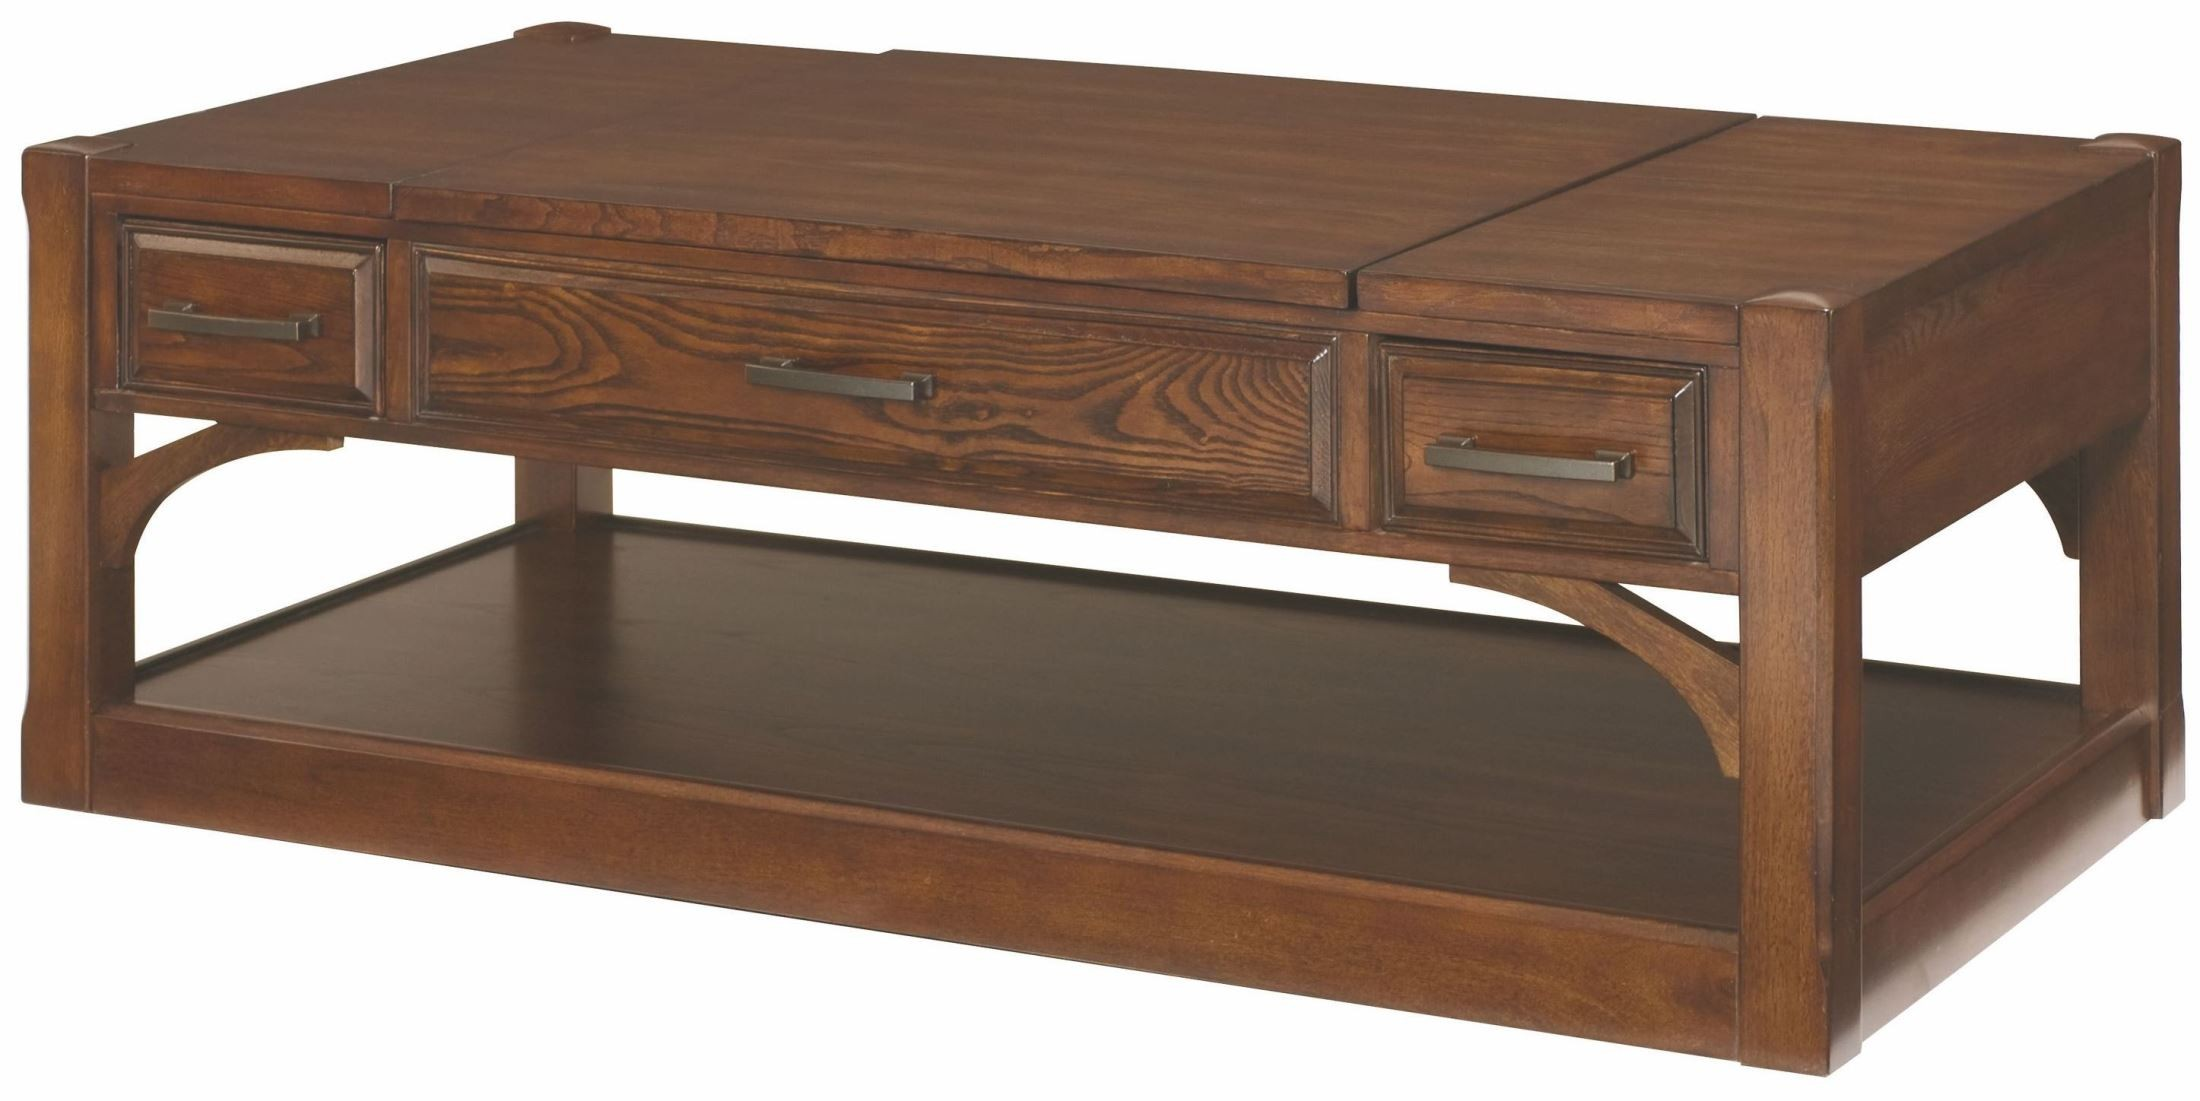 Scholar Chocolate Brown Rectangular Lift Top Cocktail Table 395 910 Hammary